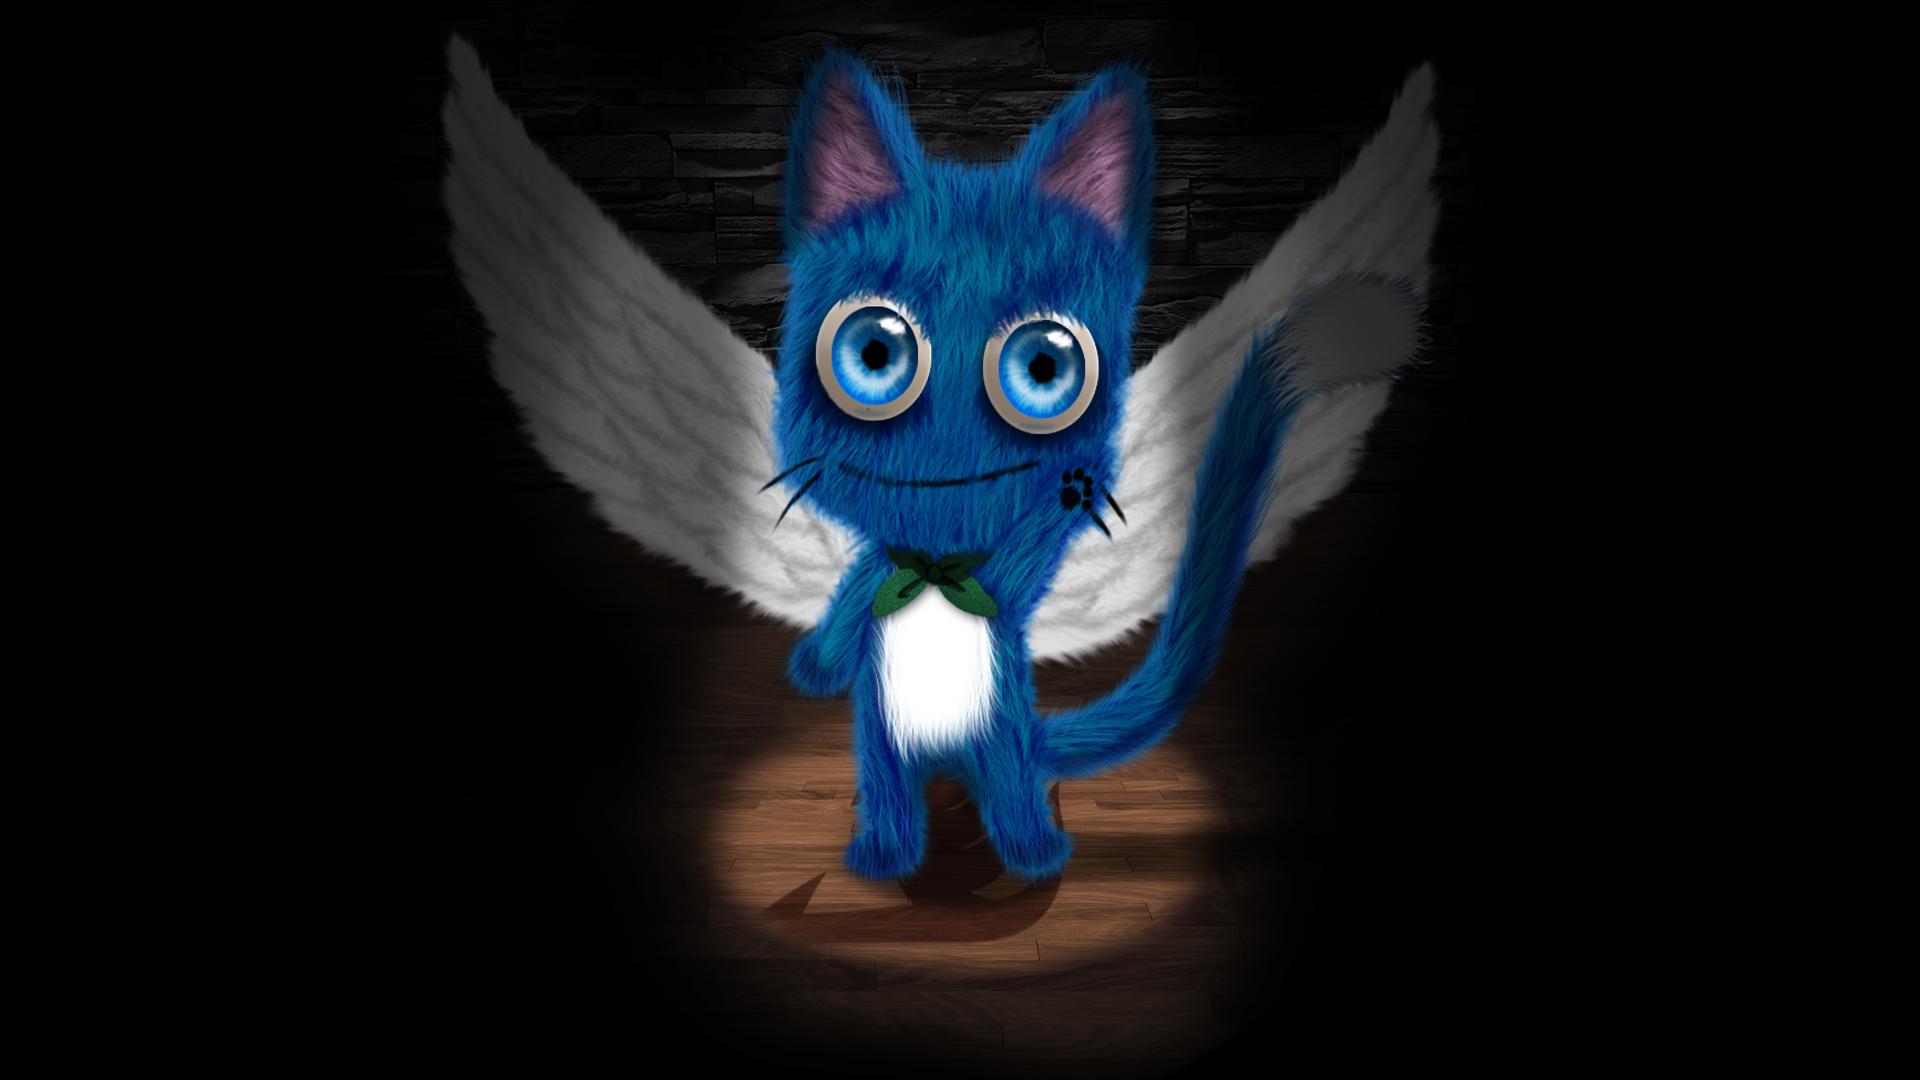 Happy - Fairy Tail by Bixes on DeviantArt